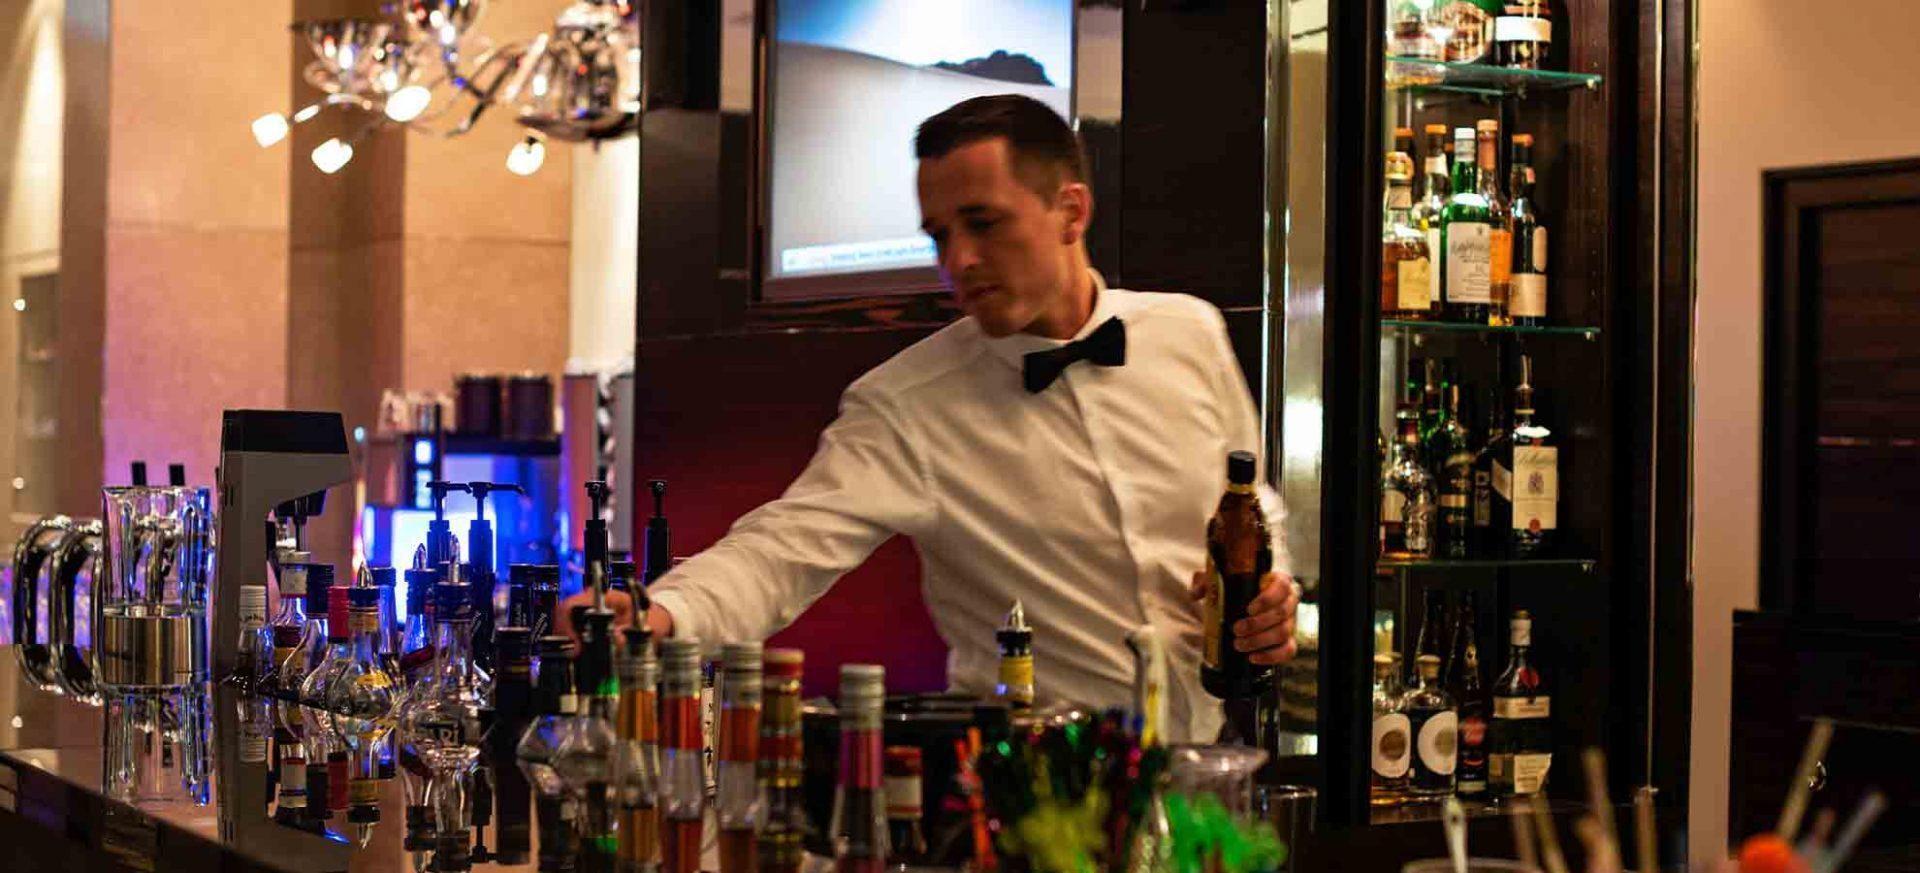 Pullman-Hotel-Dresden-Newa-Empfang-Bar-Lounge